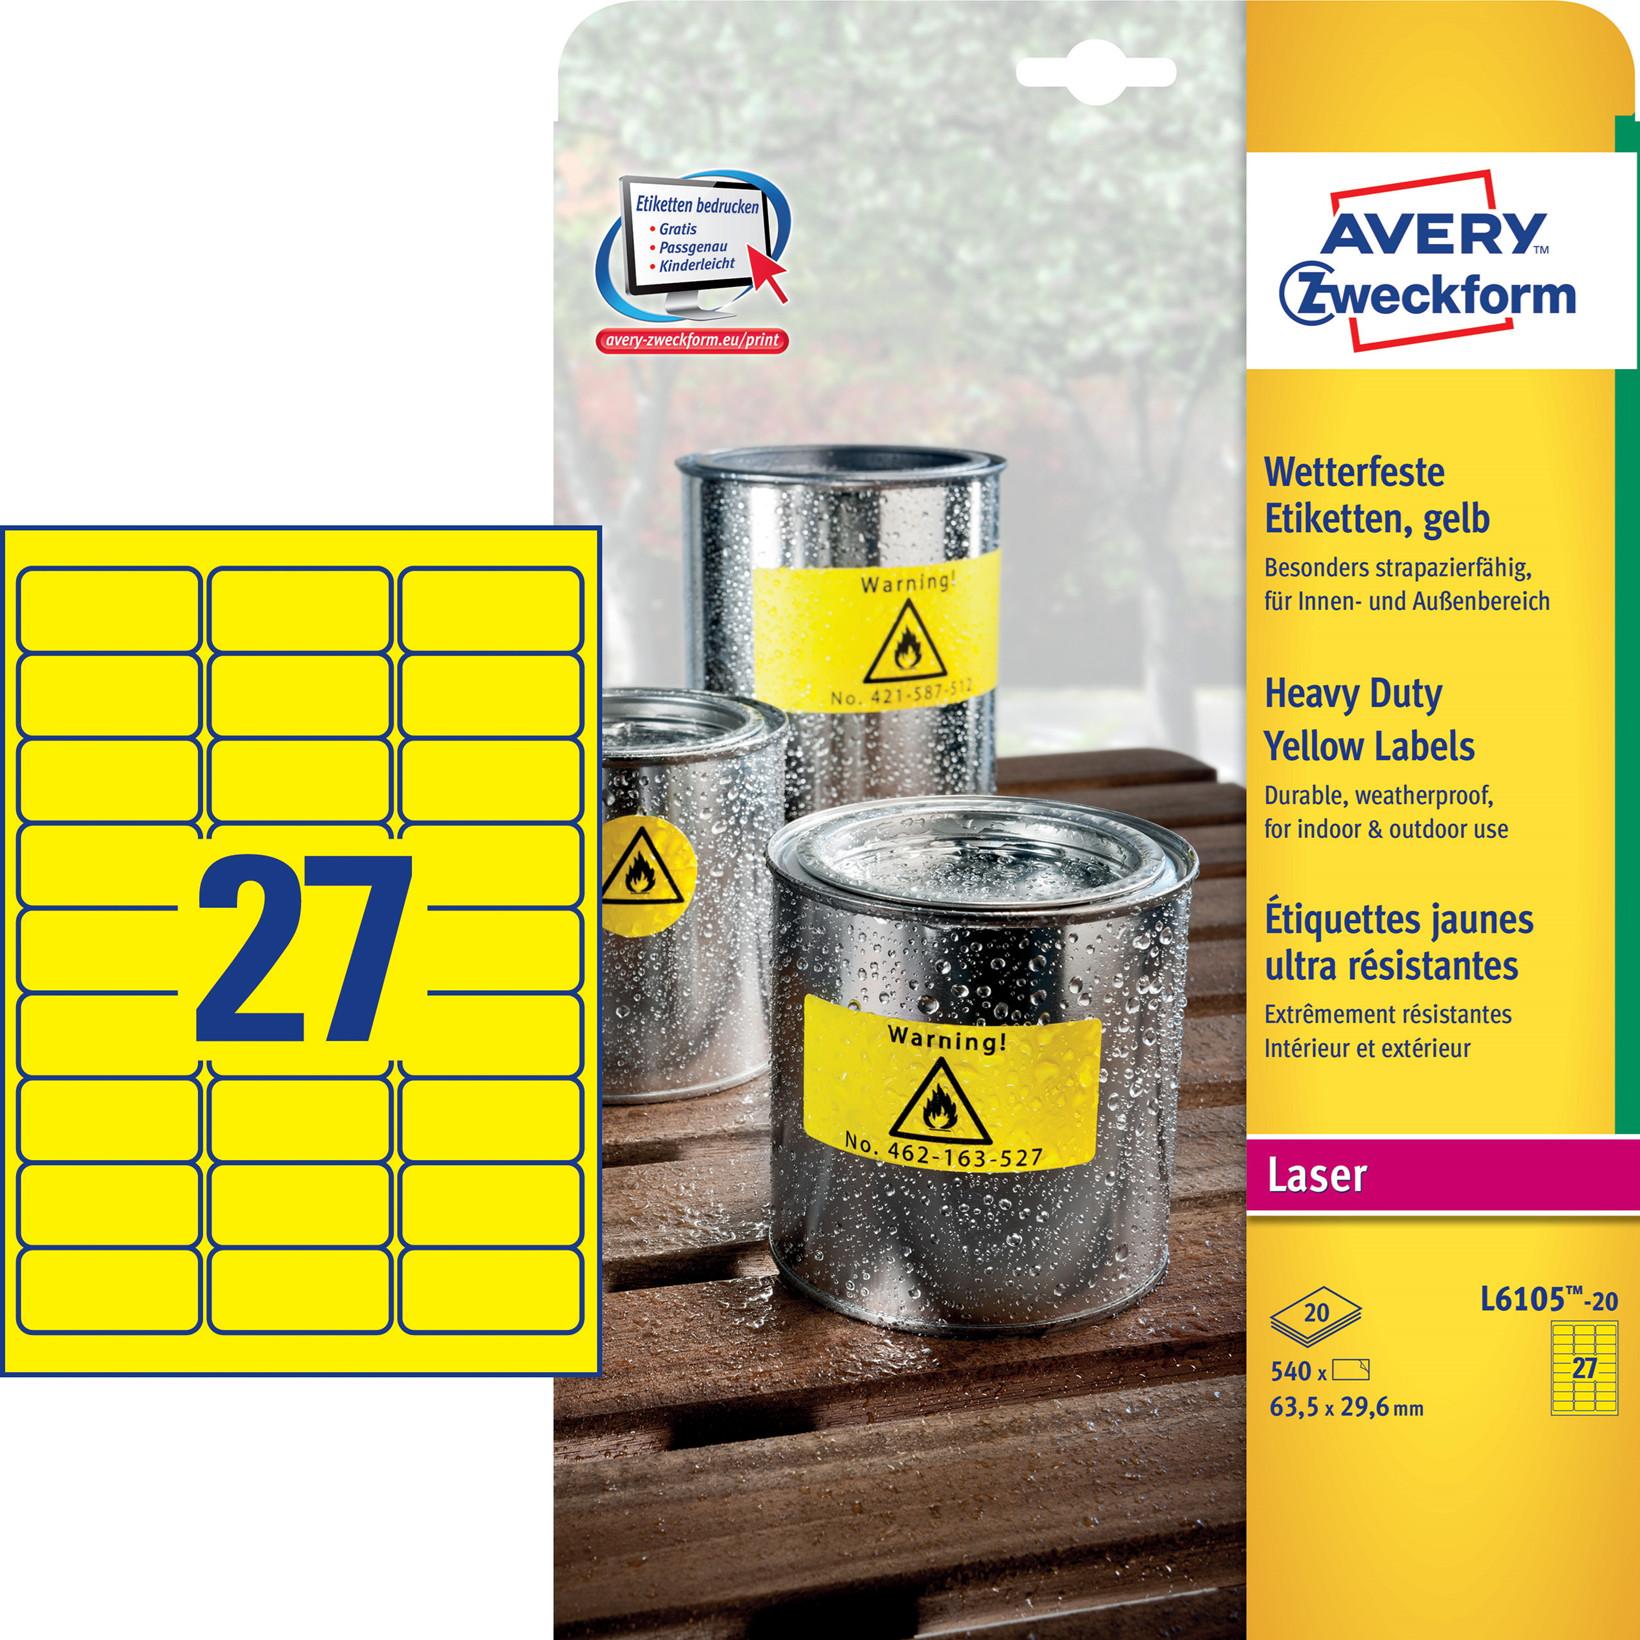 Avery L6105-20 - Laser etiket stærk gul 27 pr. ark 63,5 x 29,6 mm - 20 ark